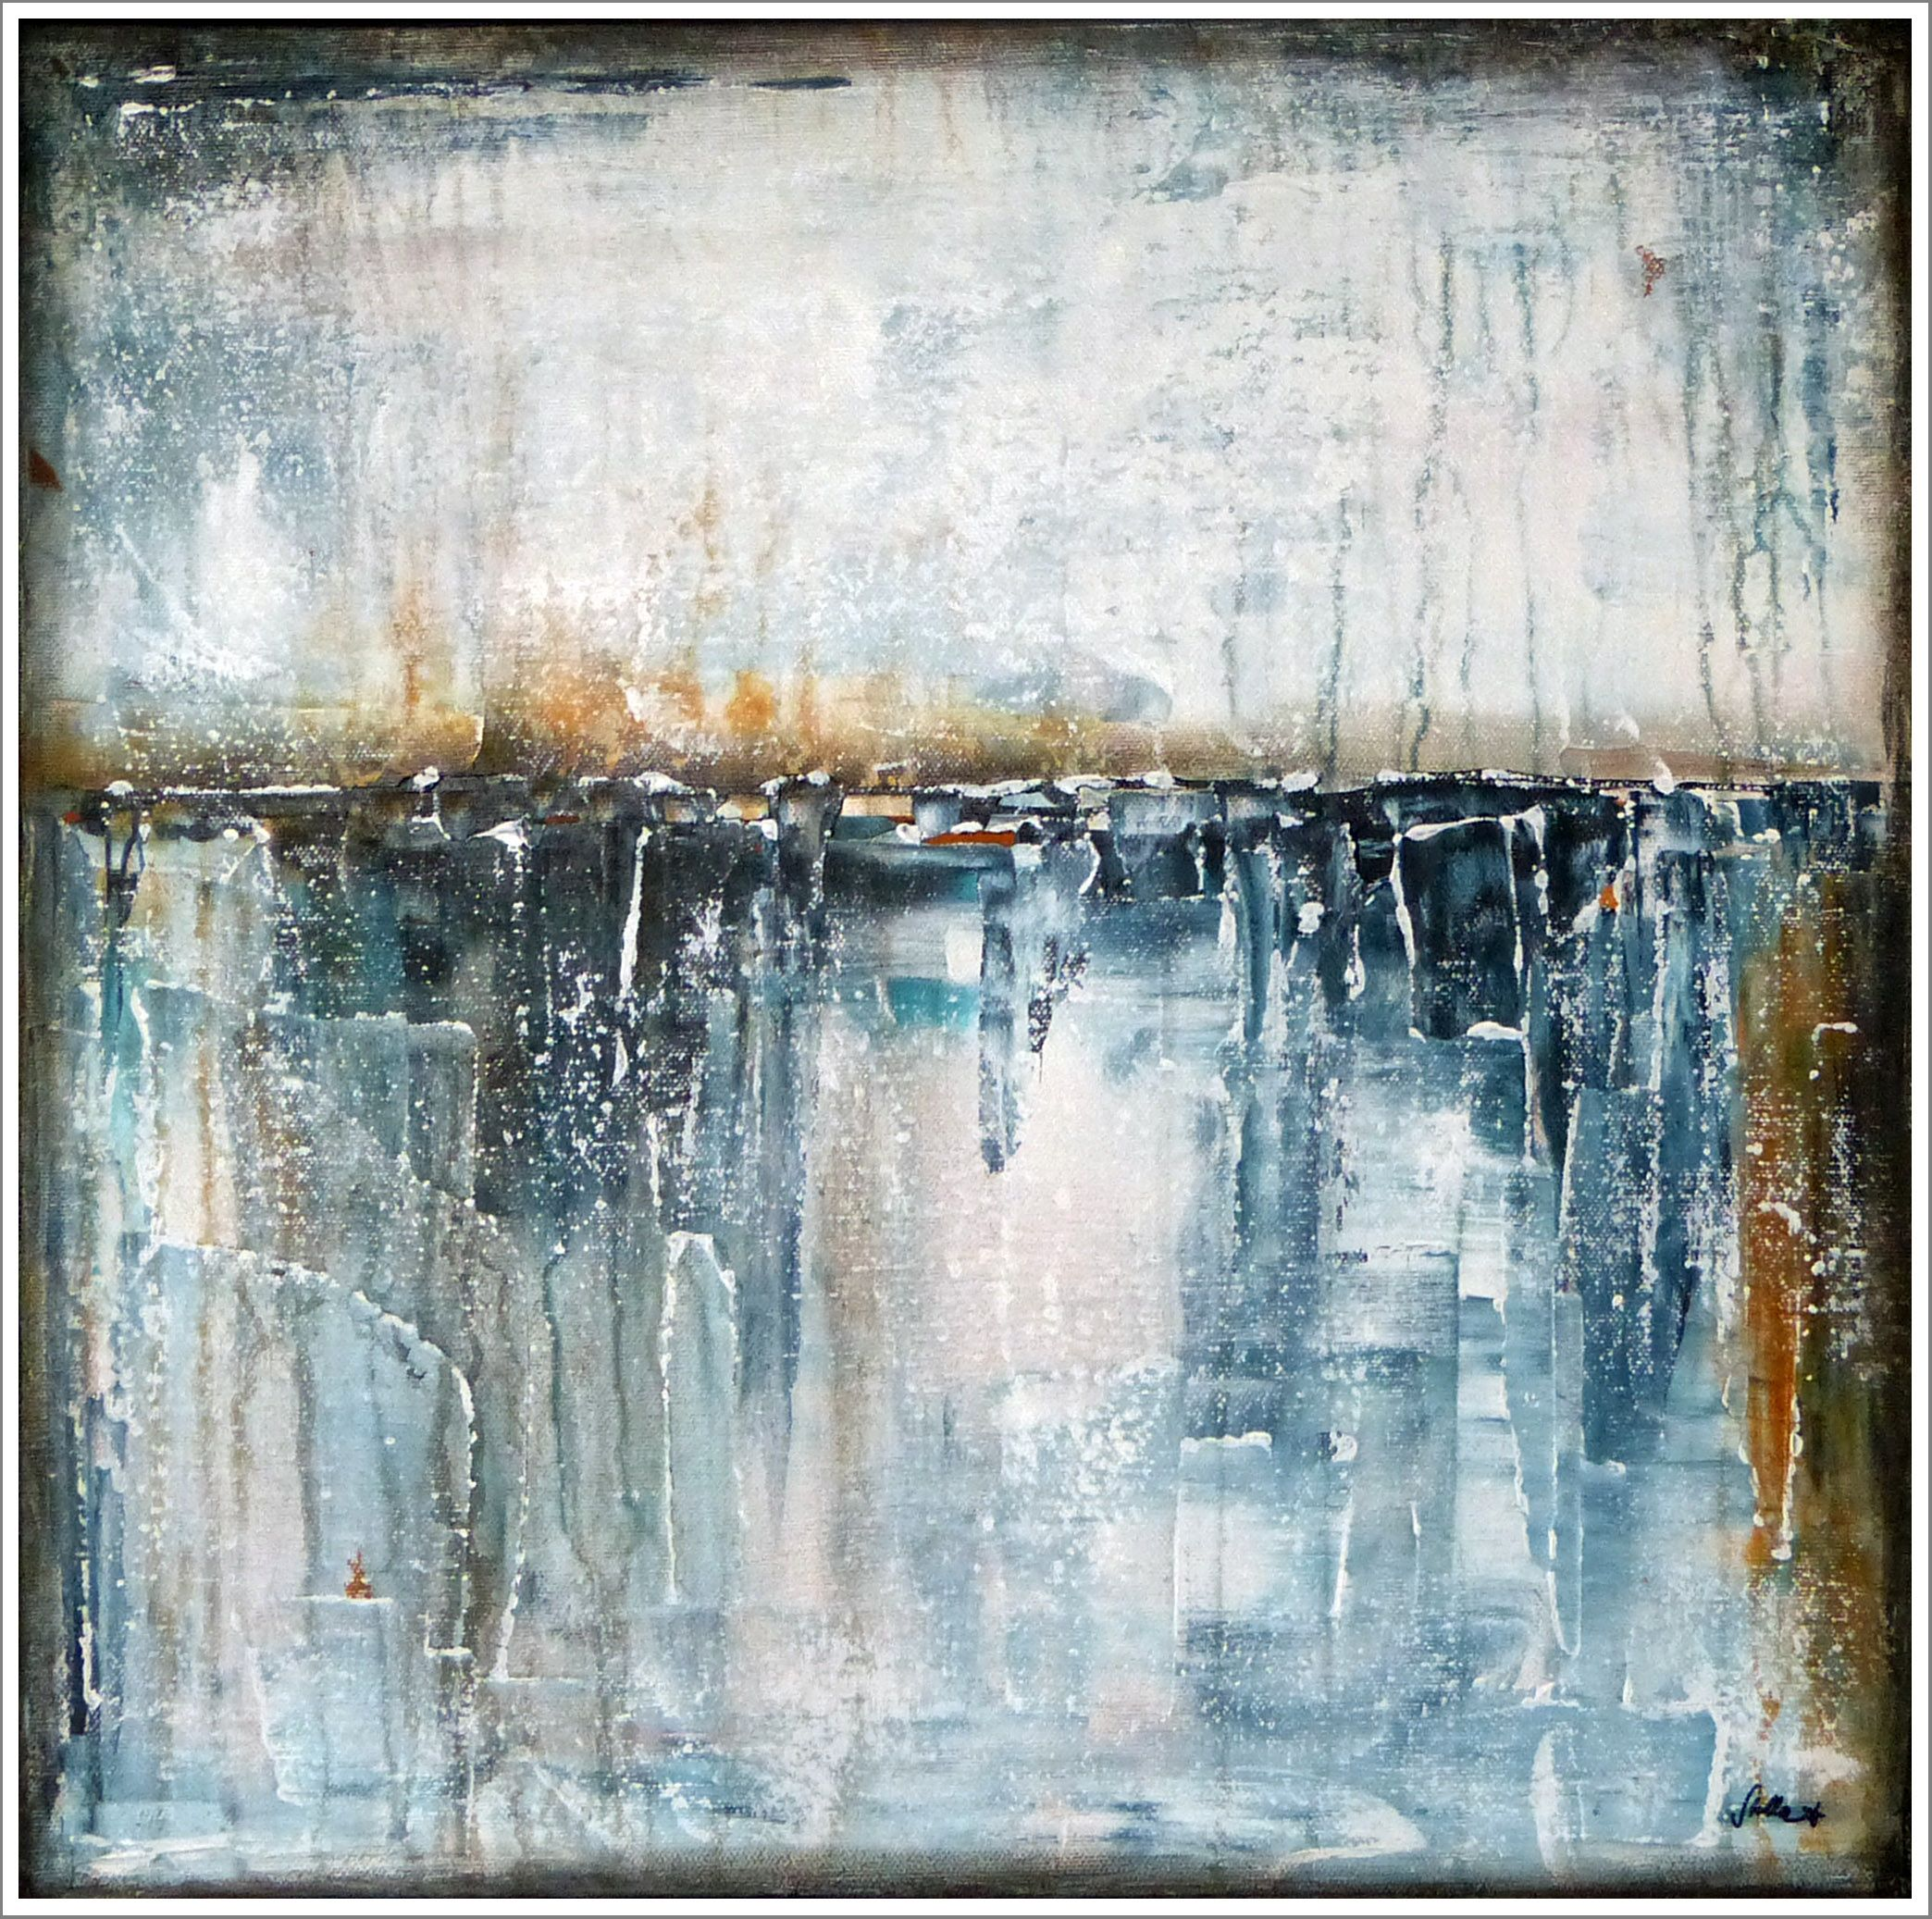 stella hettner silver river blues 50x50 abstrakte malerei kunst tapete abstrakt abstraktes bild malen kaufen